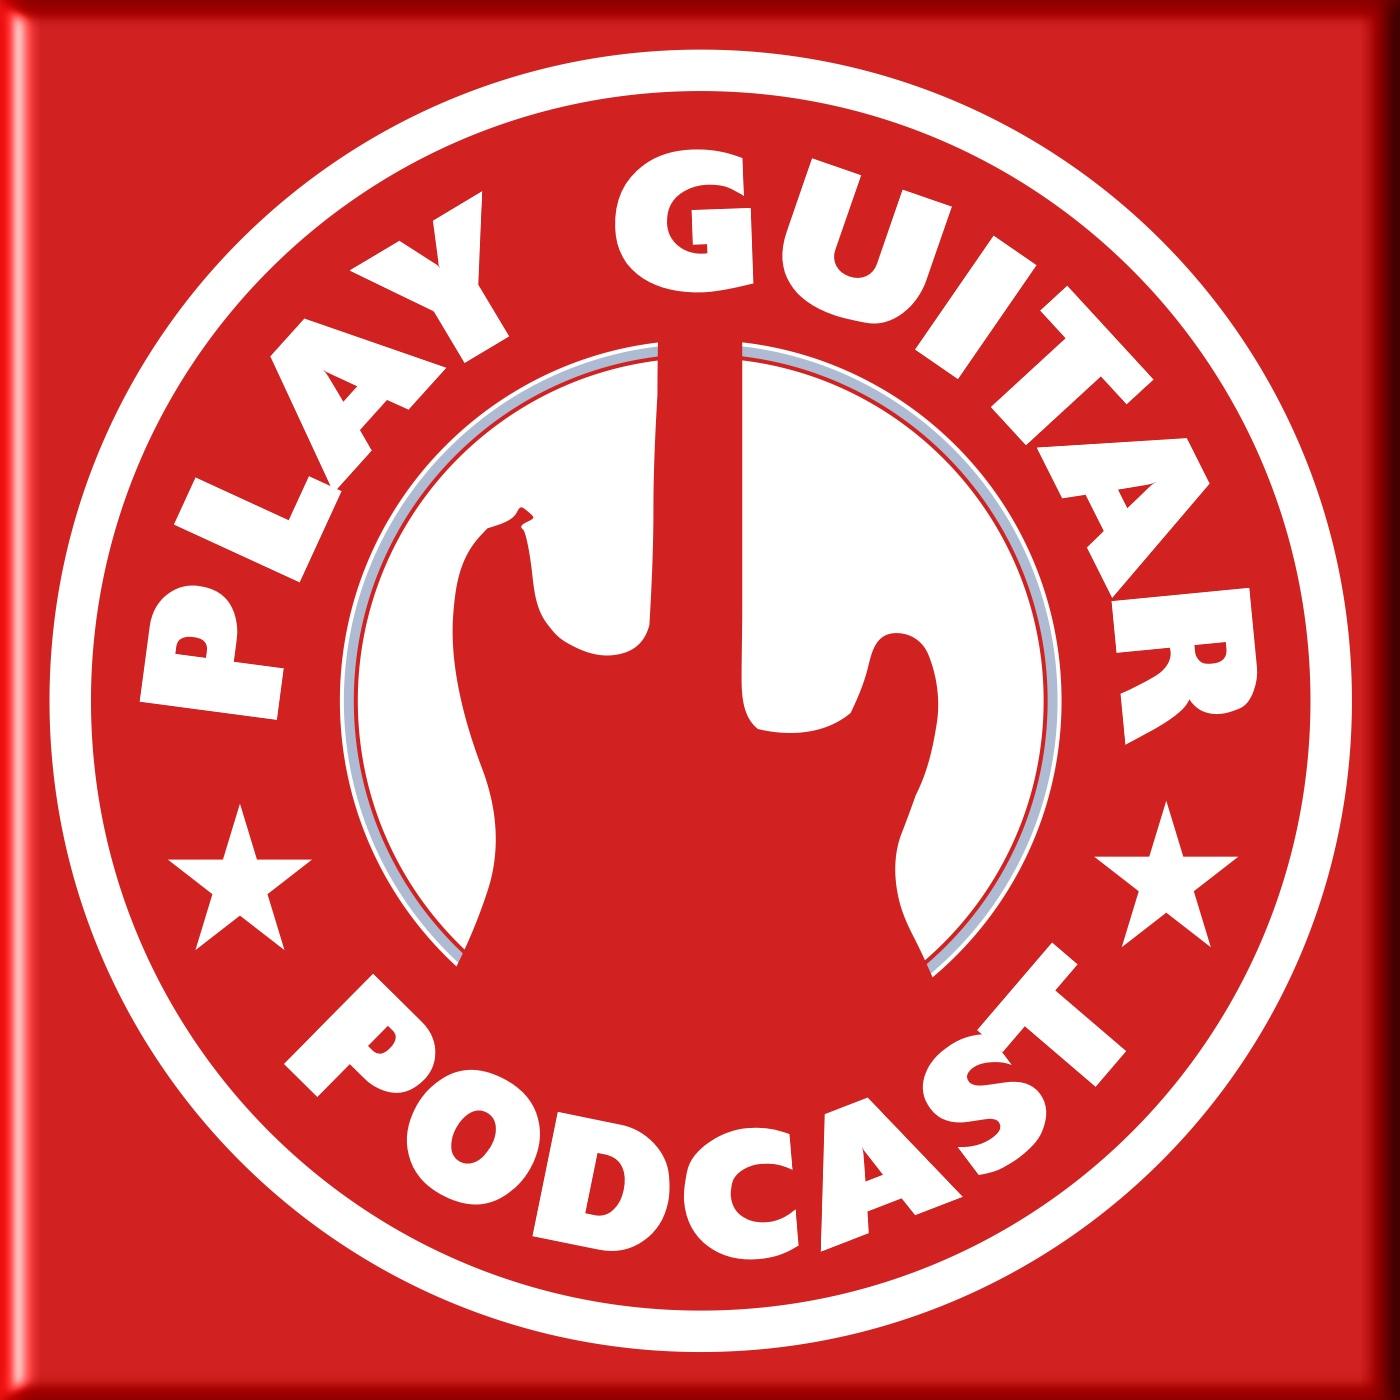 Play Guitar Podcast show art